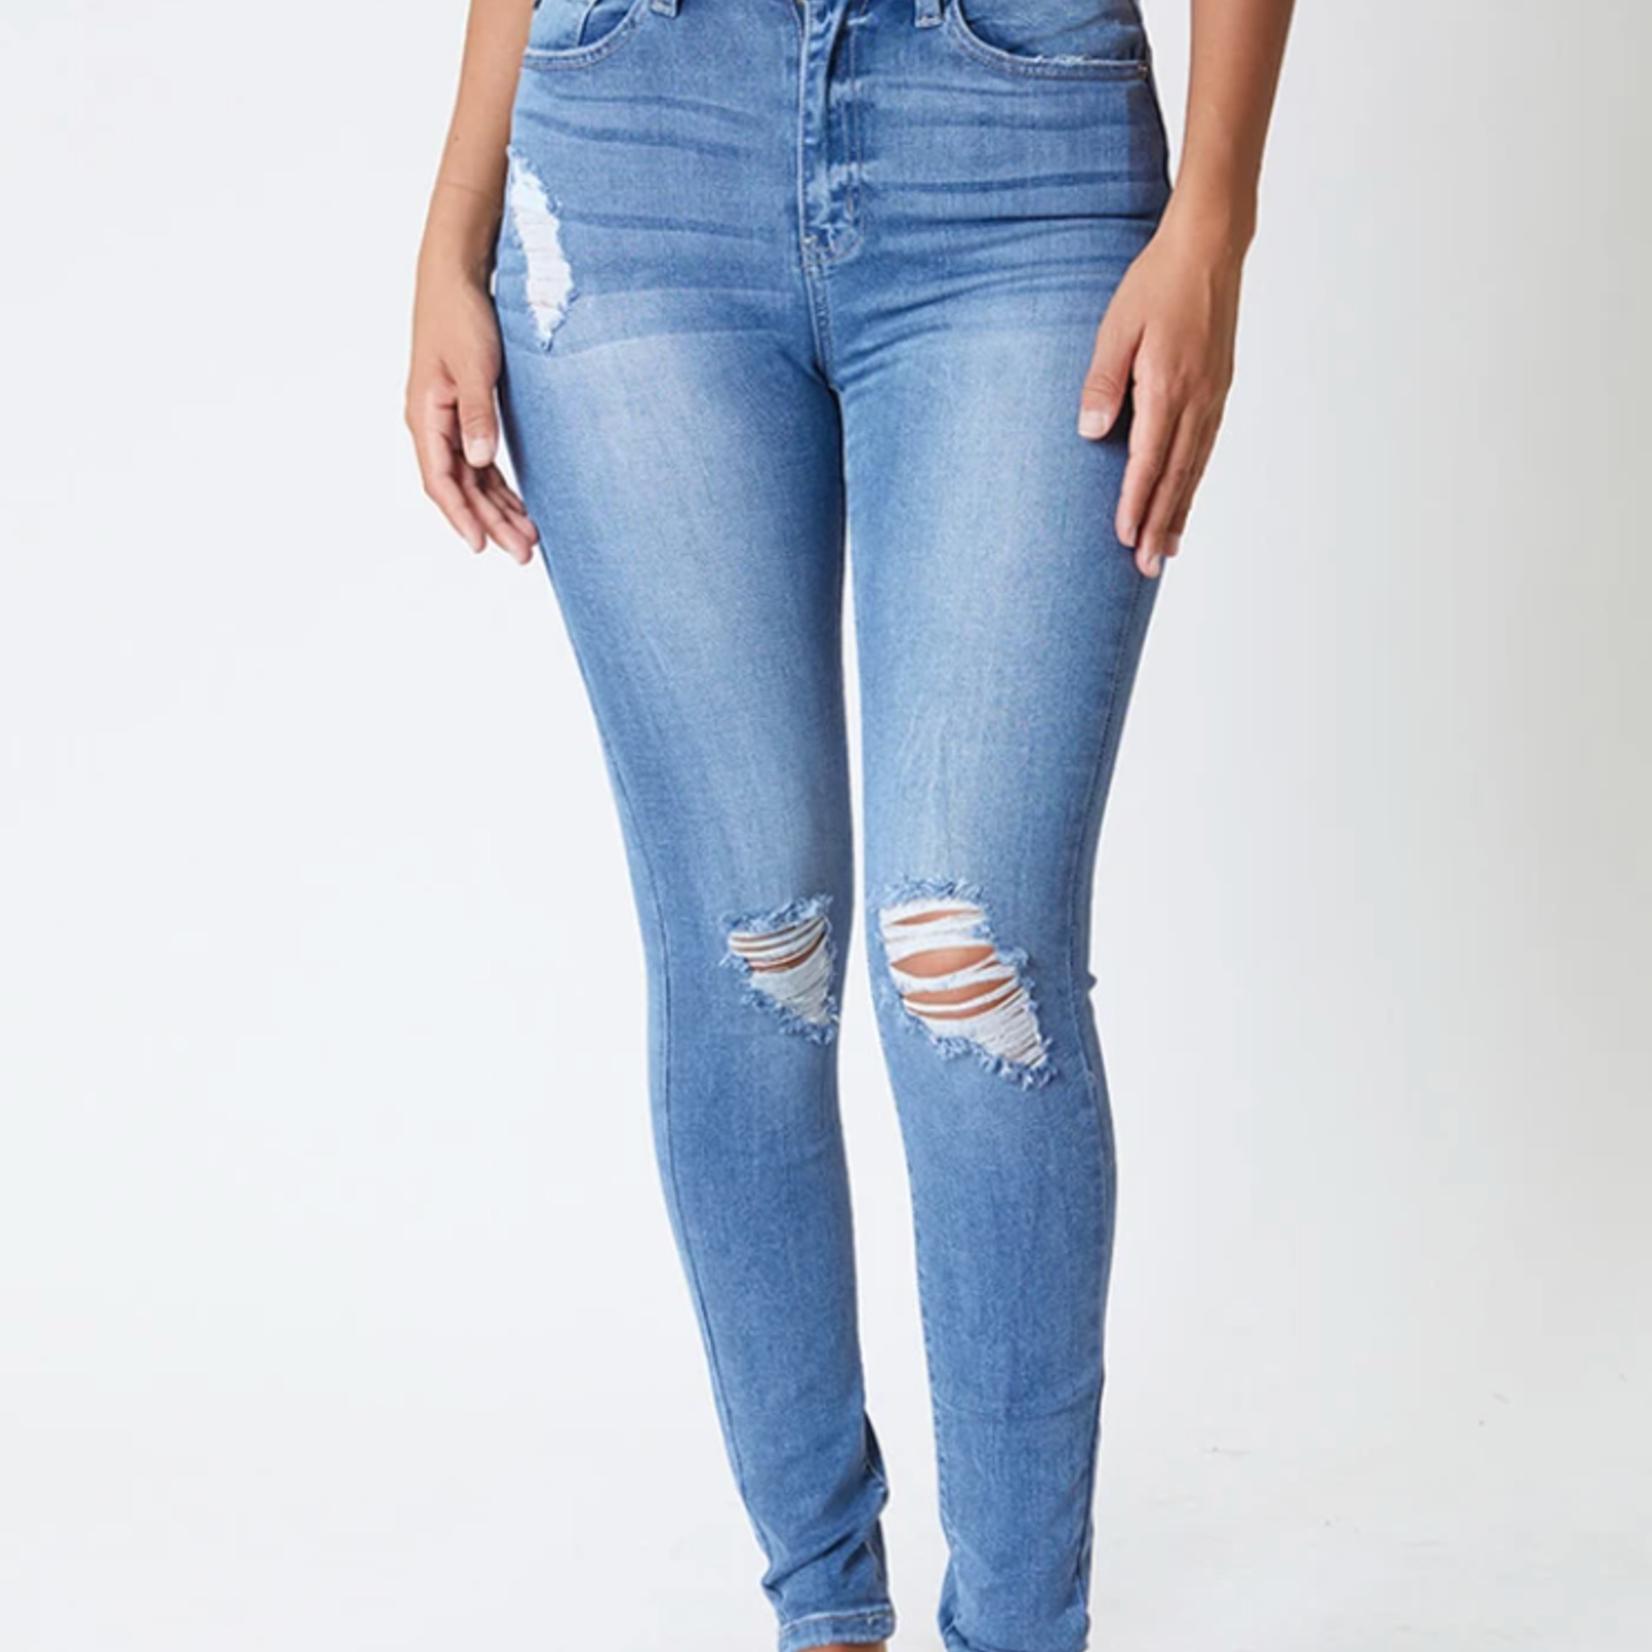 Kancan Bradynn High Rise Super Skinny Jeans KC6223M